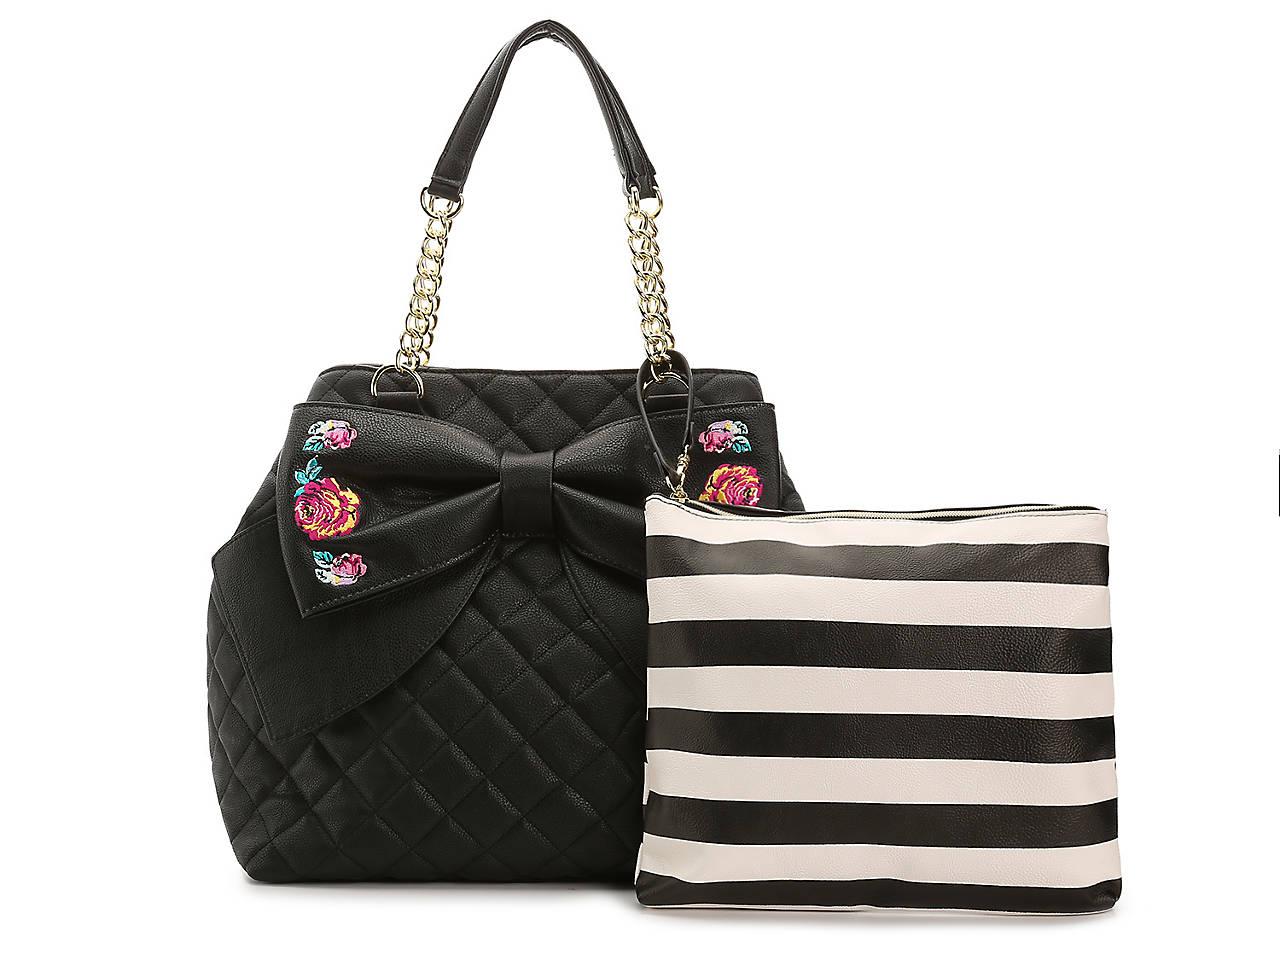 c6d1535d8a00 Betsey Johnson Trape Tote Women s Handbags   Accessories